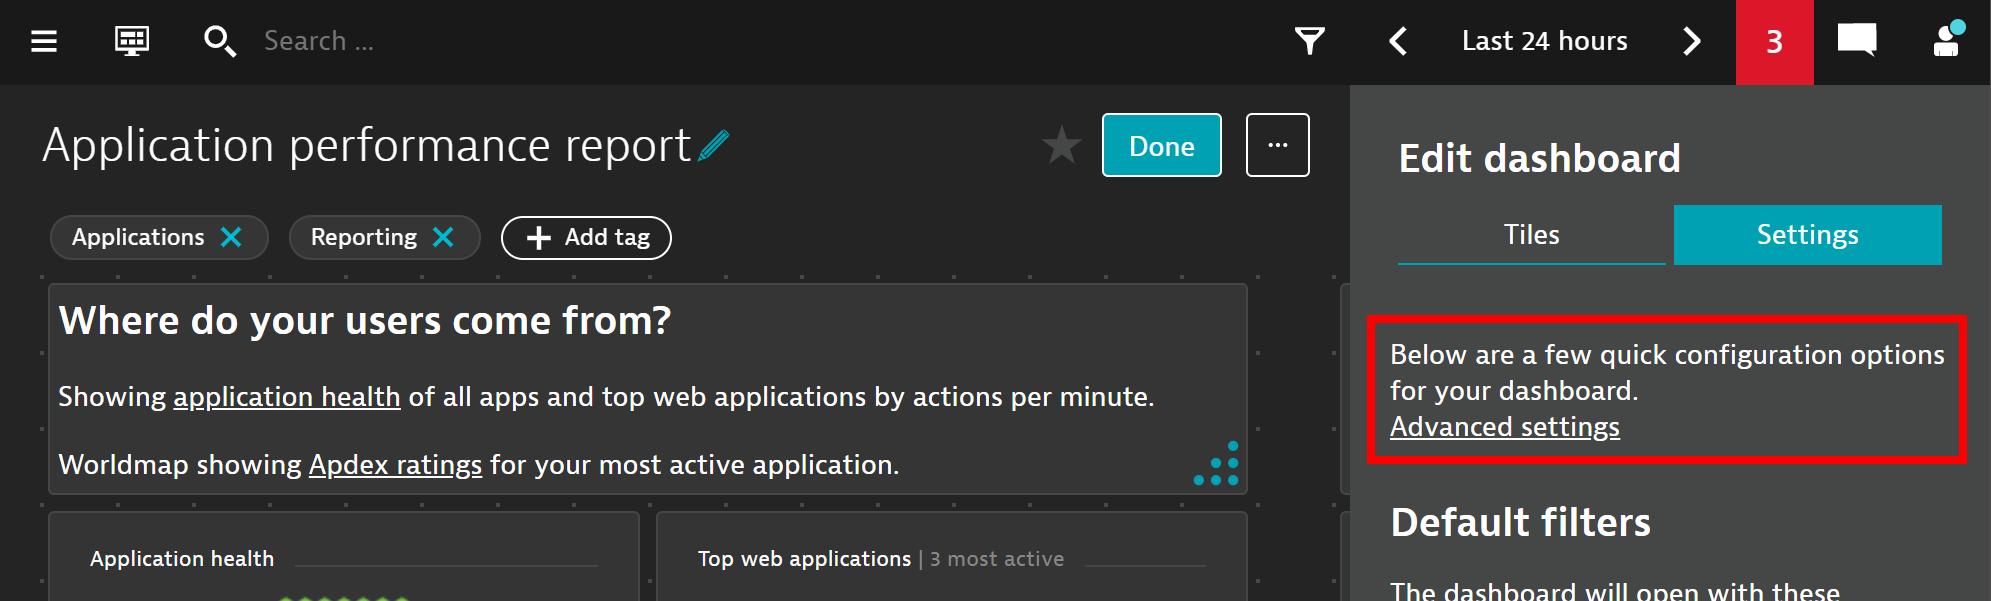 How to navigate to dashboard advanced settings